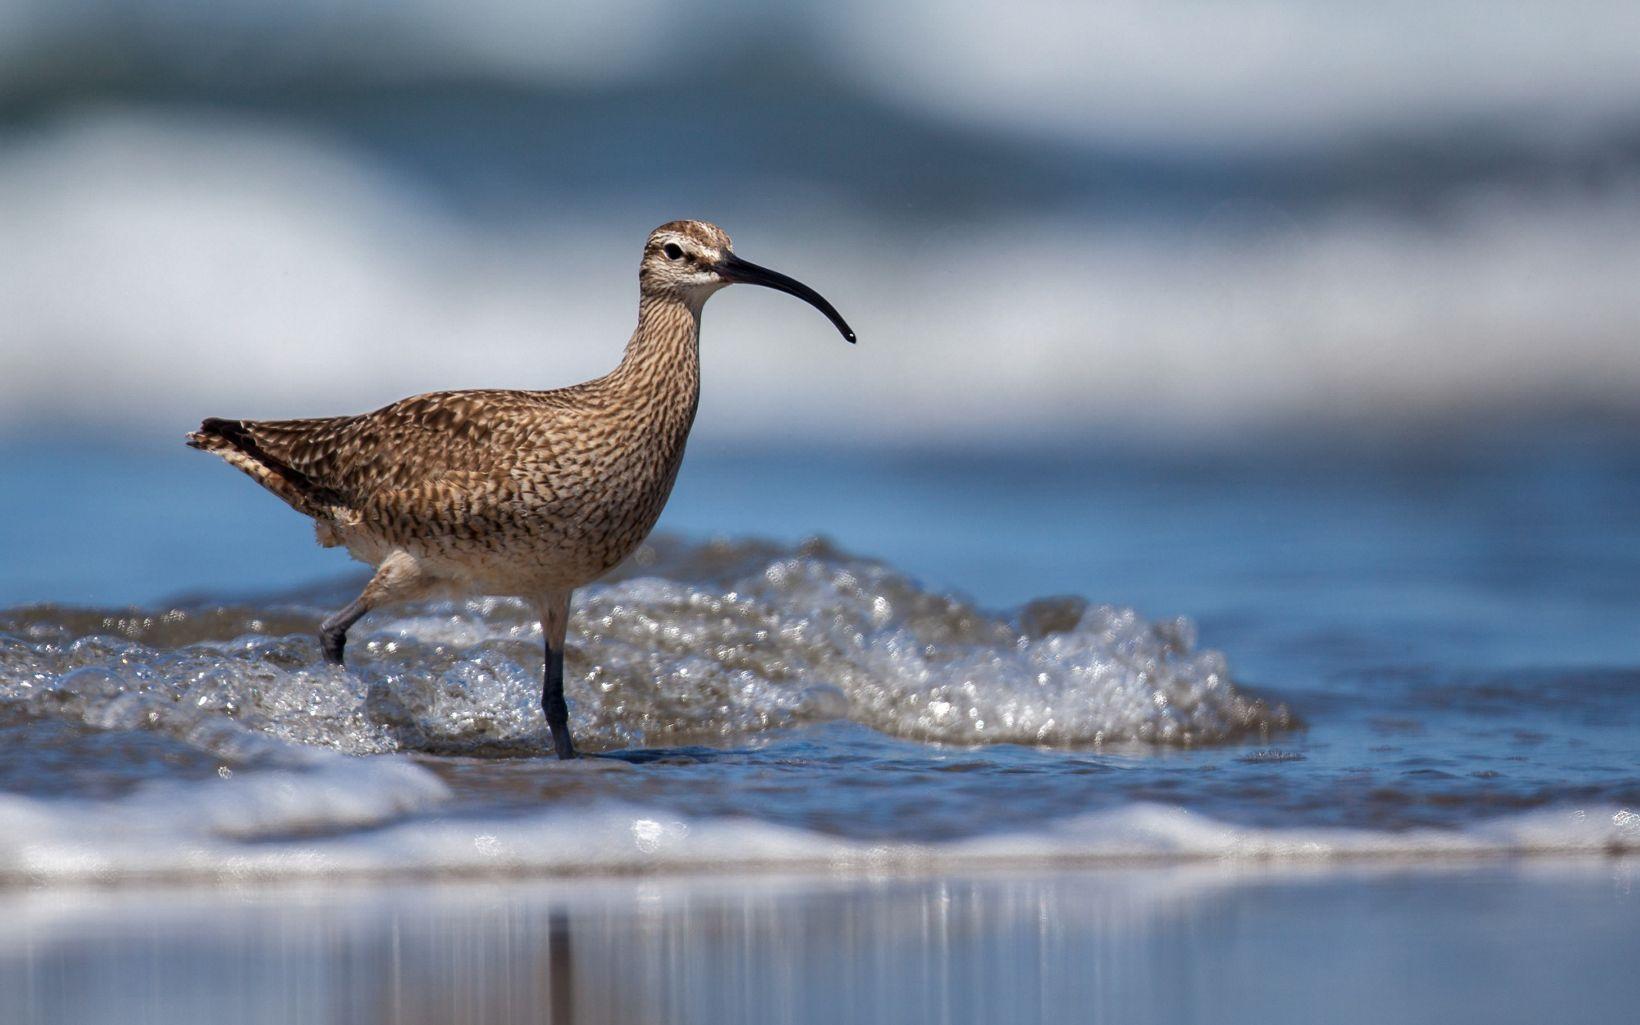 Long billed brown, beige and white speckled bird splashing in shallow water.